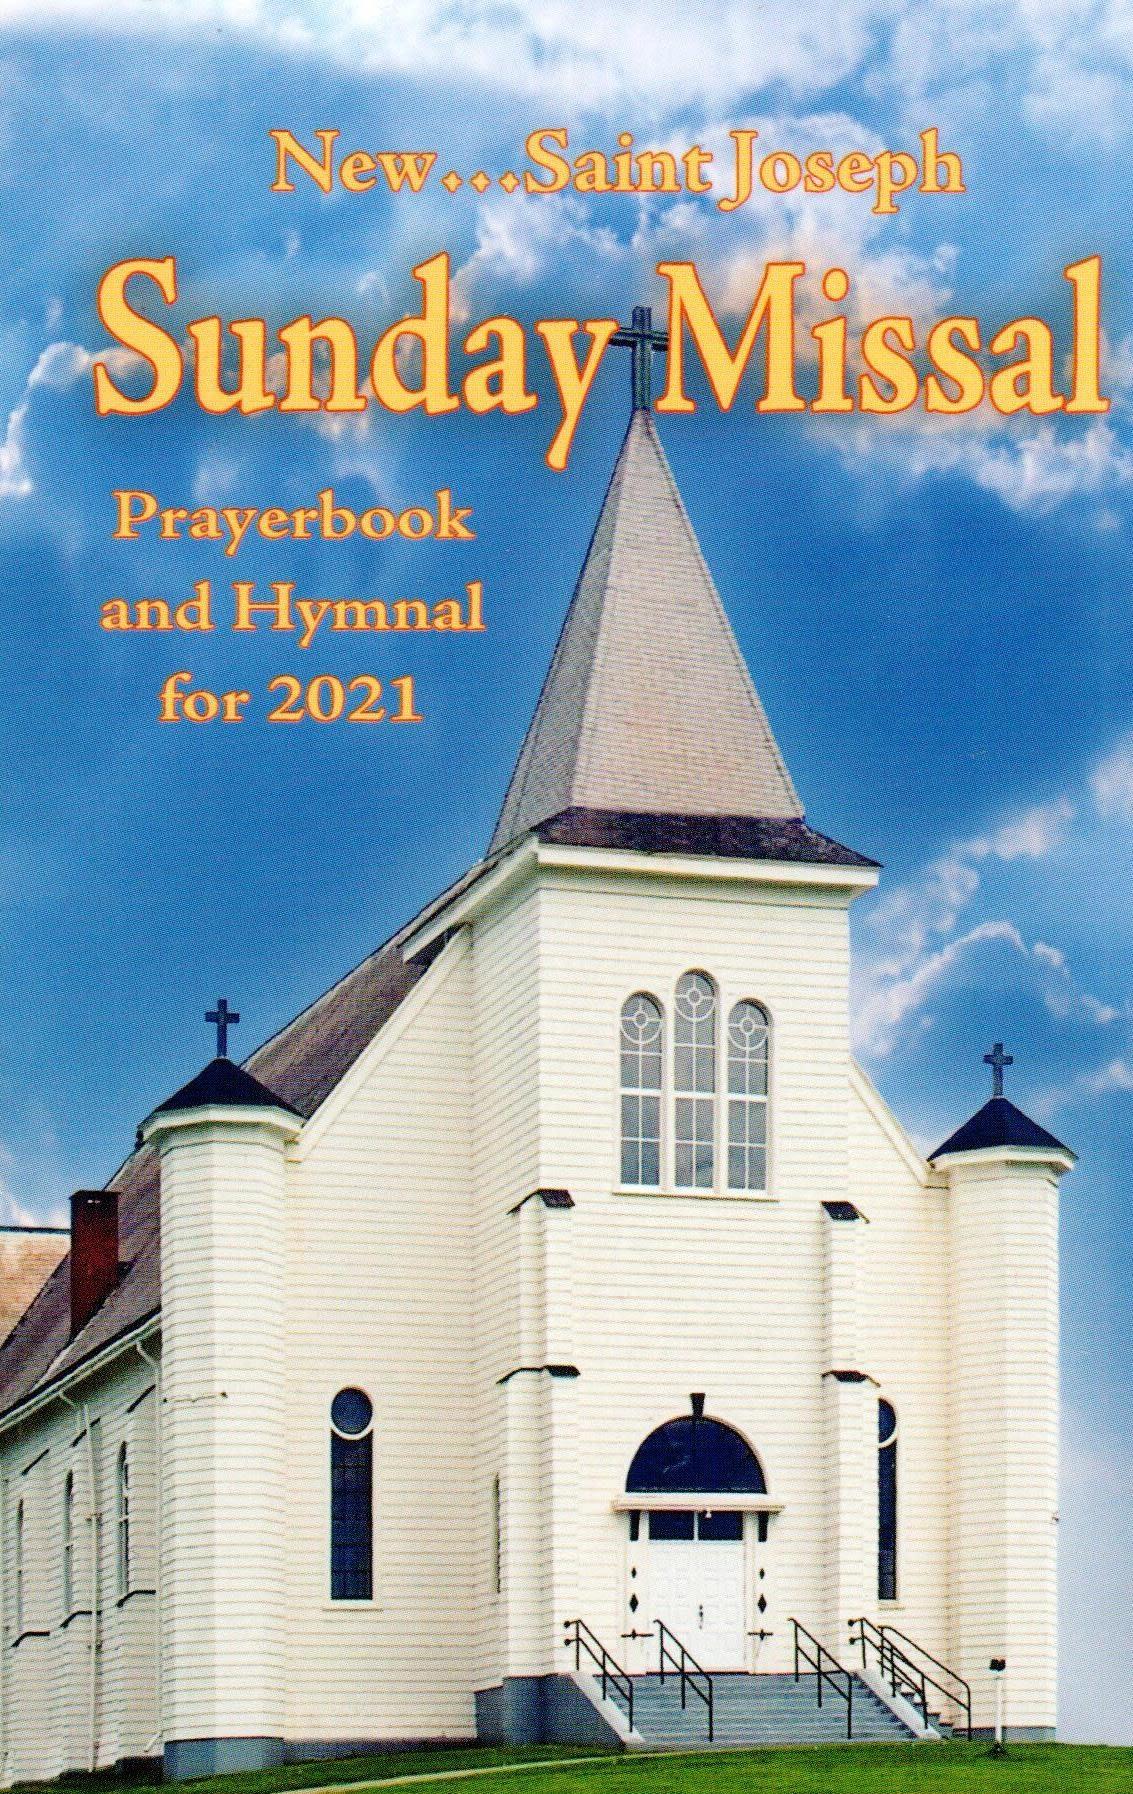 St. Joseph Sunday Missal 2021